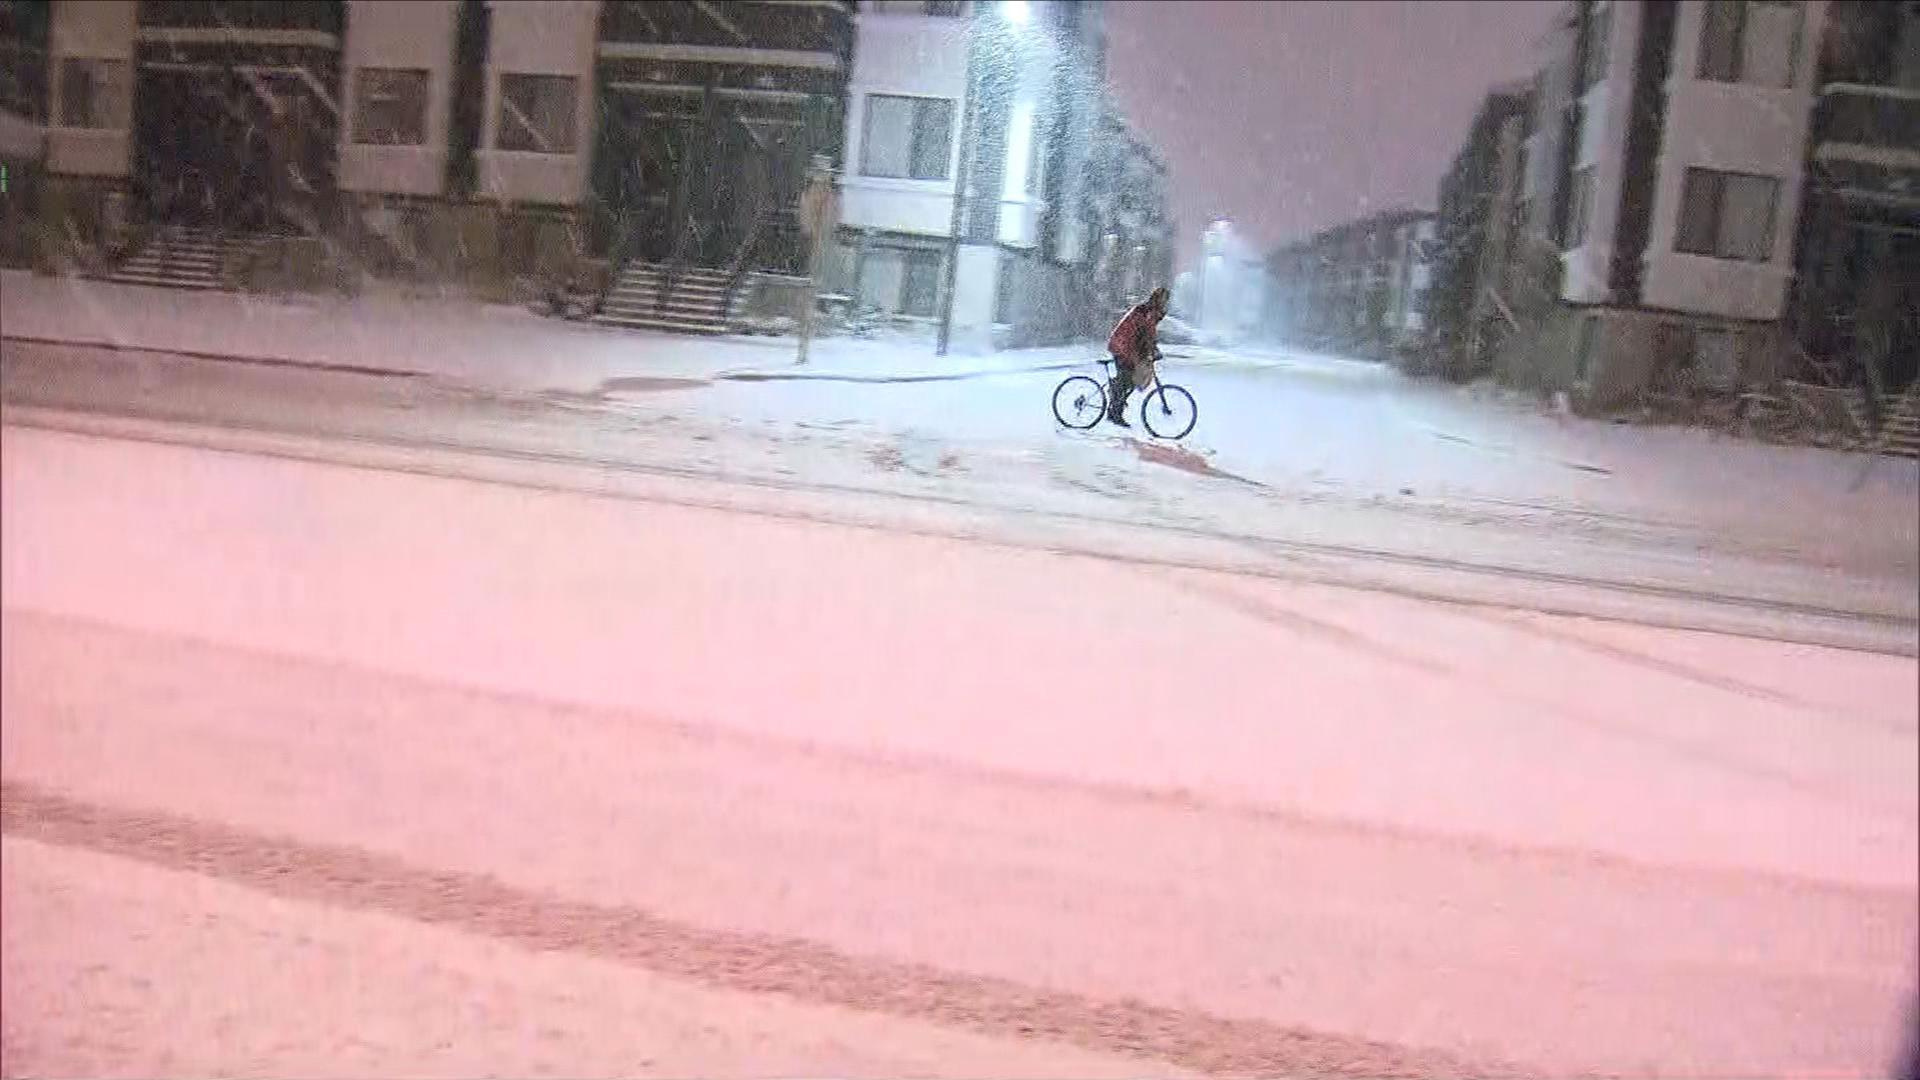 A cyclist rides their bike during a snowfall in the Richmond Hill area on Dec. 5, 2016. CITYNEWS/Bertram Dandy